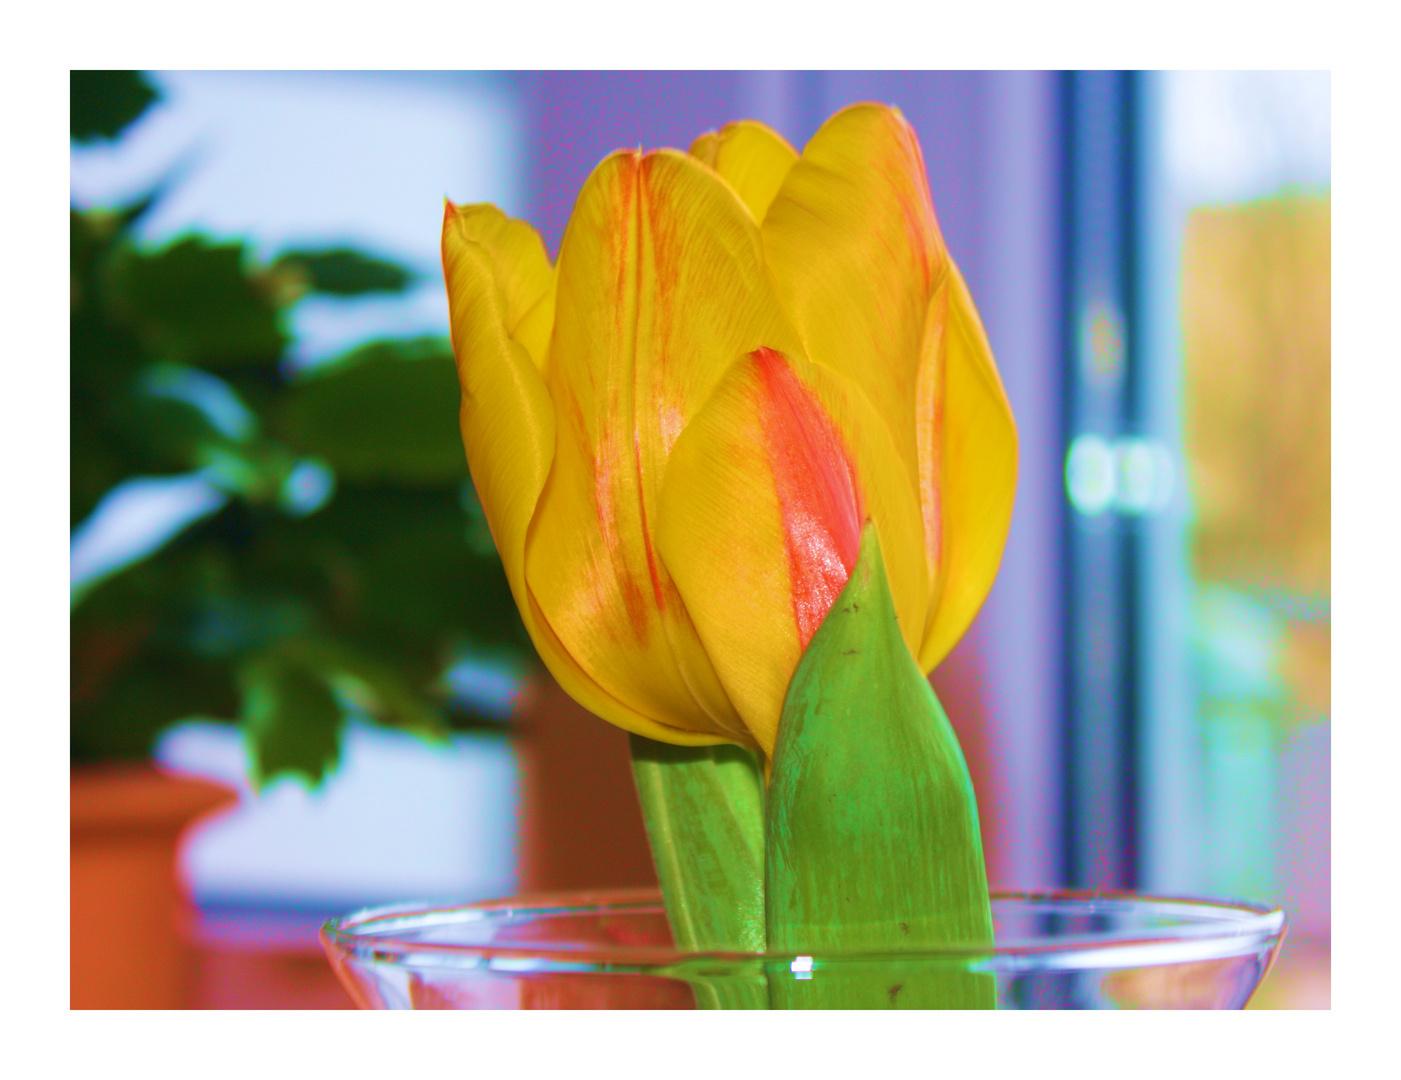 Frühling im Glas 2